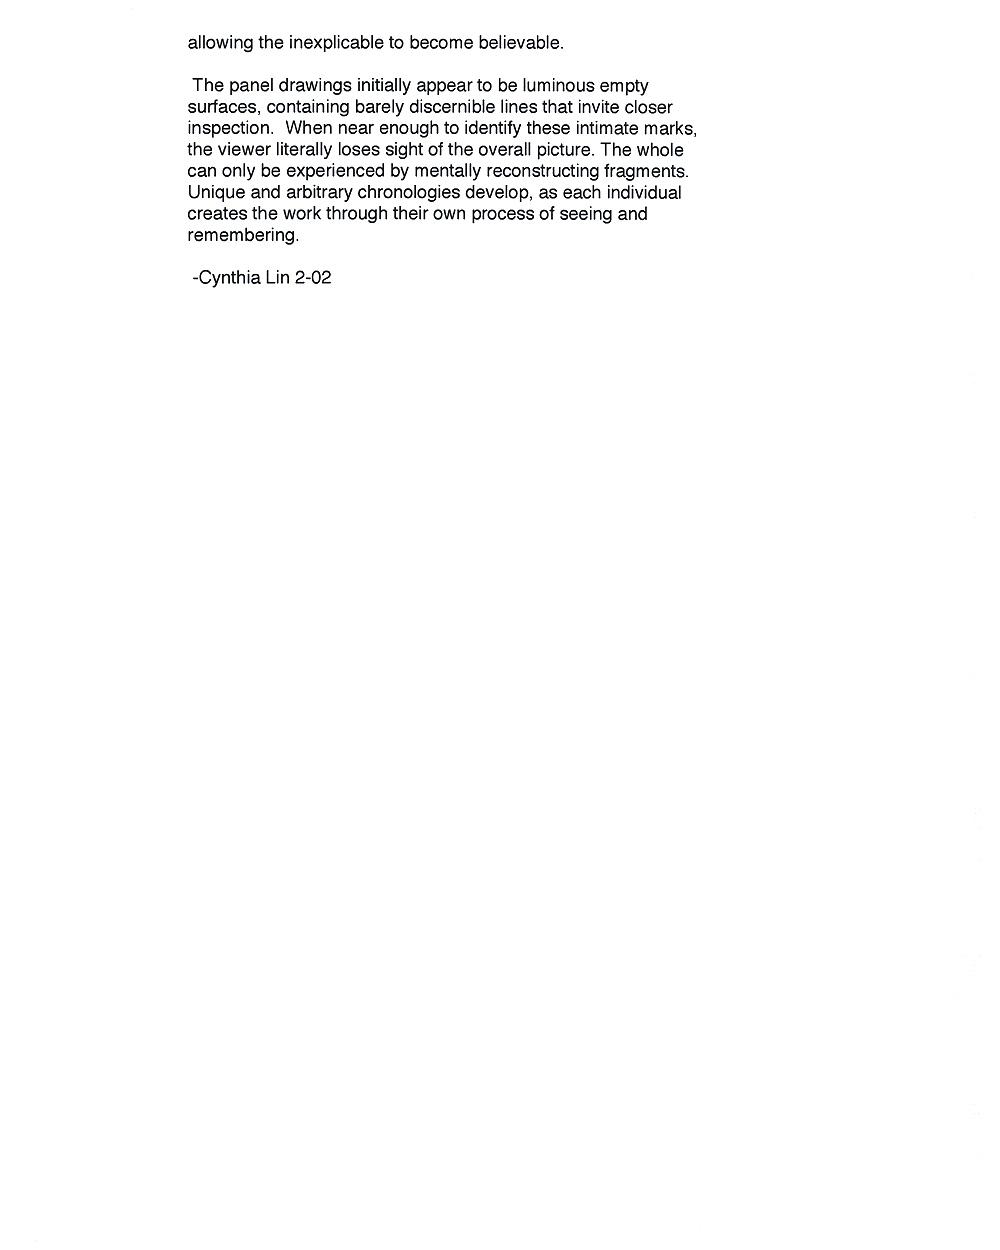 Cynthia Lin's Artist Statement (2), pg 3